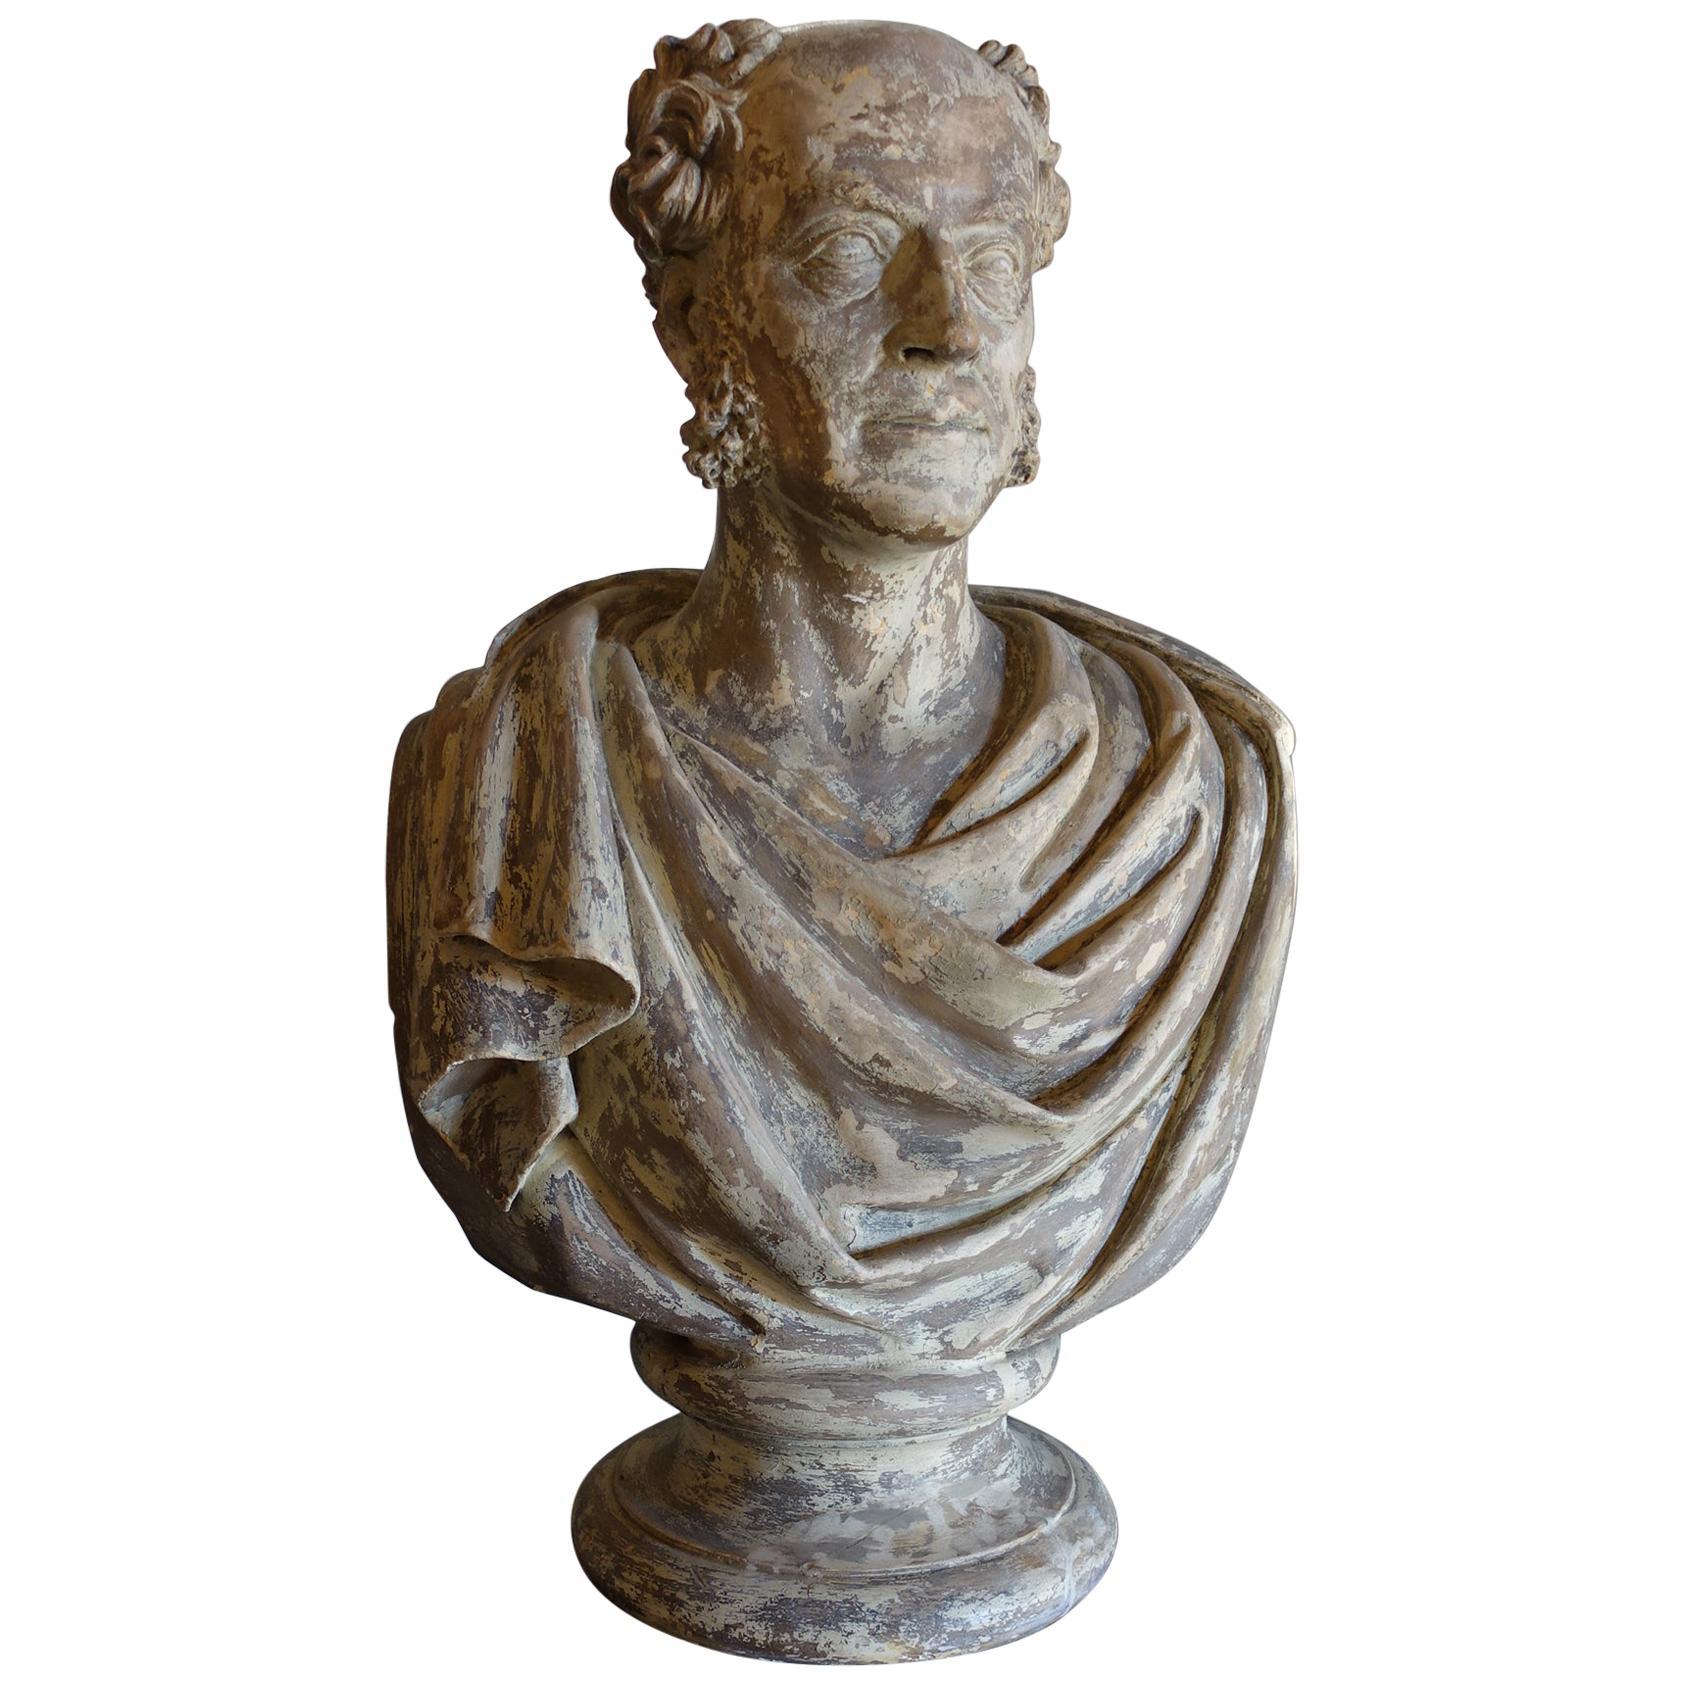 19th Century Plaster Sculpture Bust of John Michael Shum